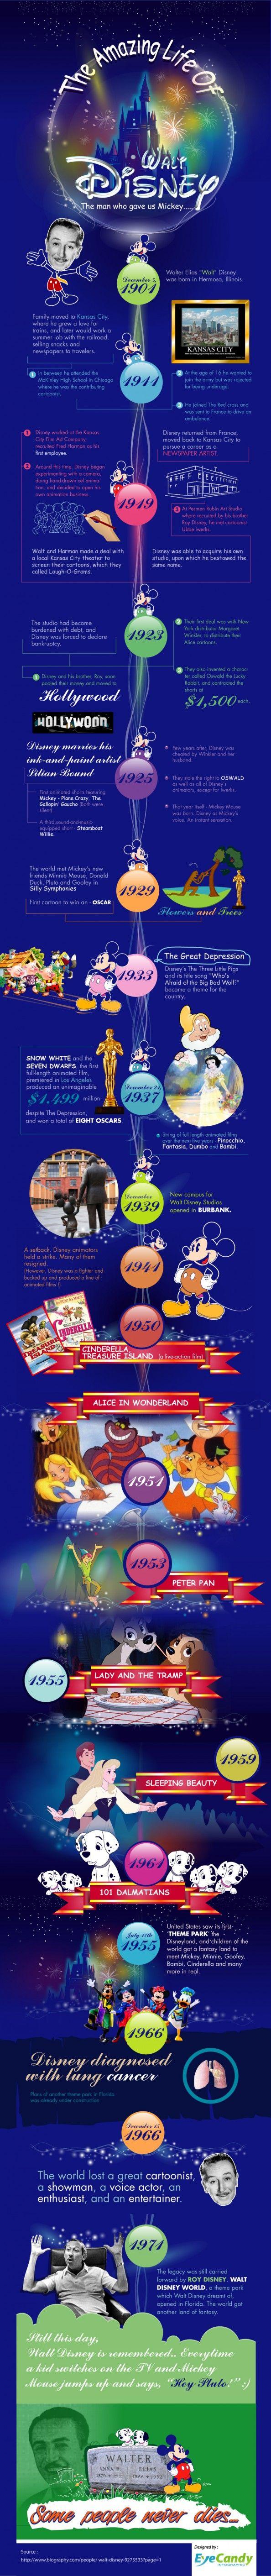 The Amazing Life of Walt Disney [Infographic] #disney #waltdisney